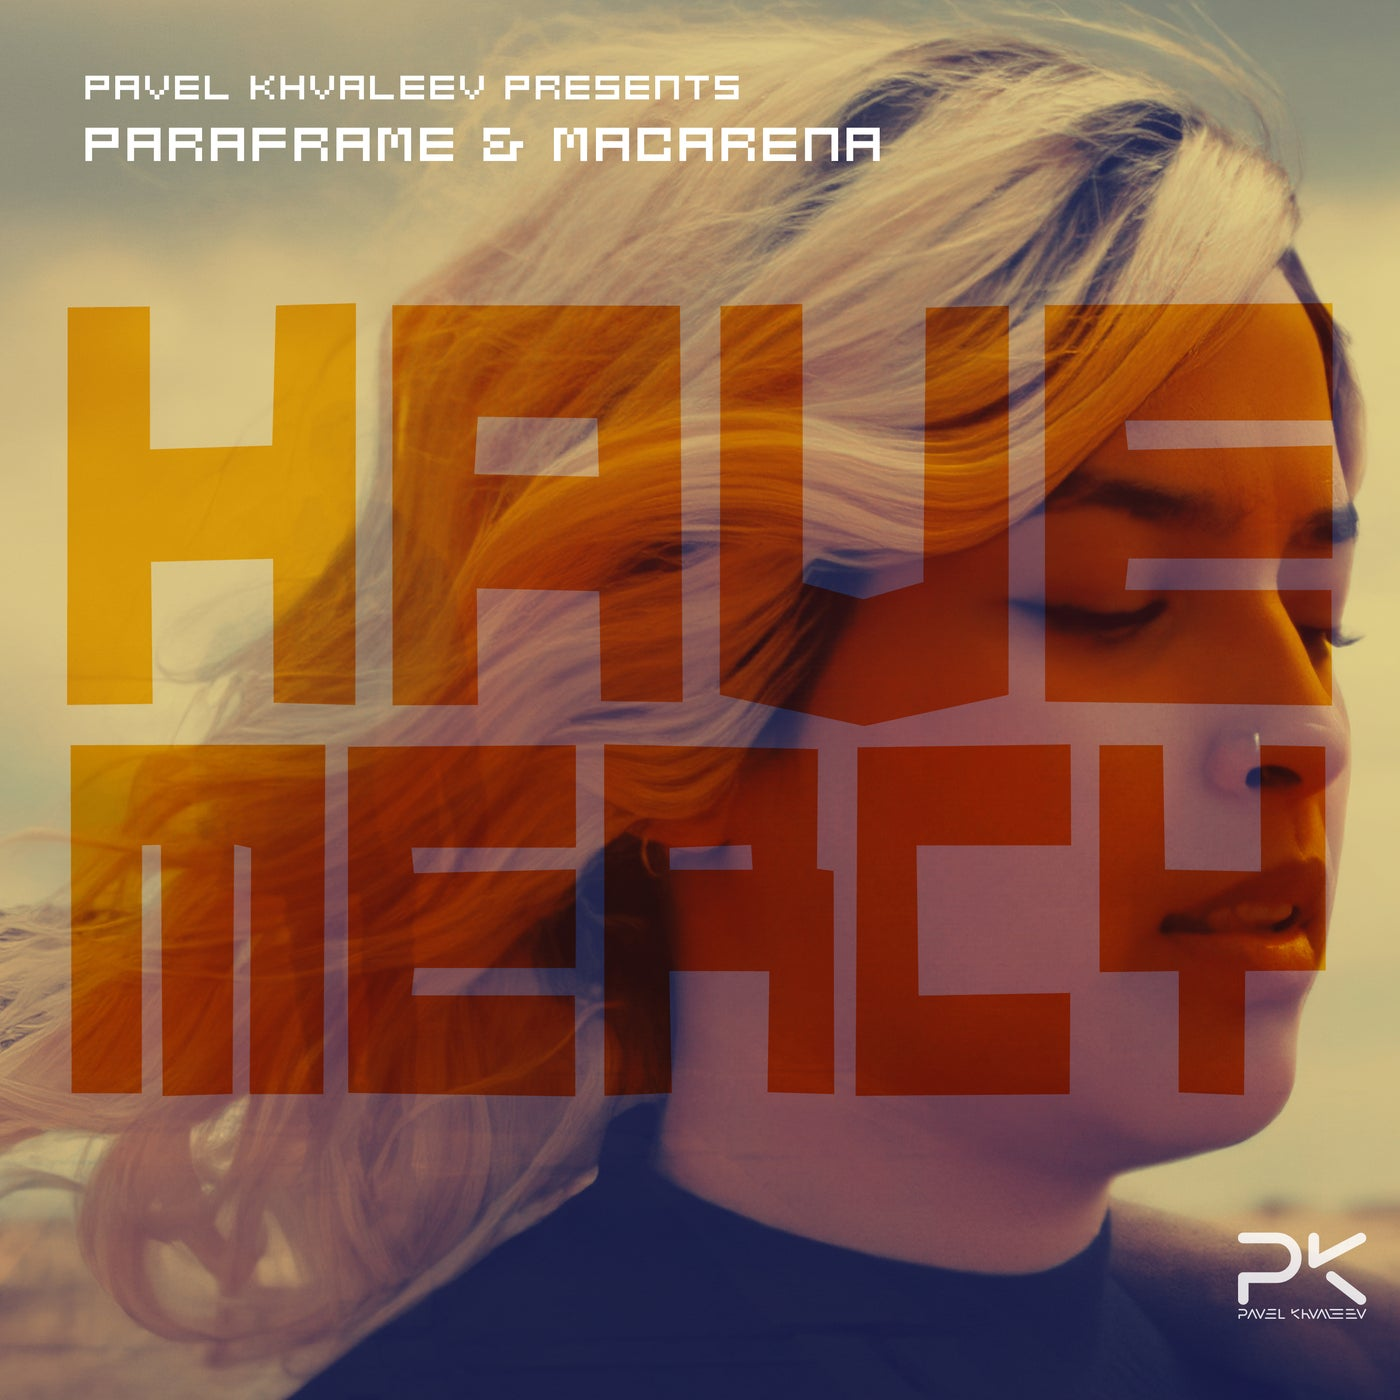 Have Mercy (Pavel Khvaleev Extended Remix)